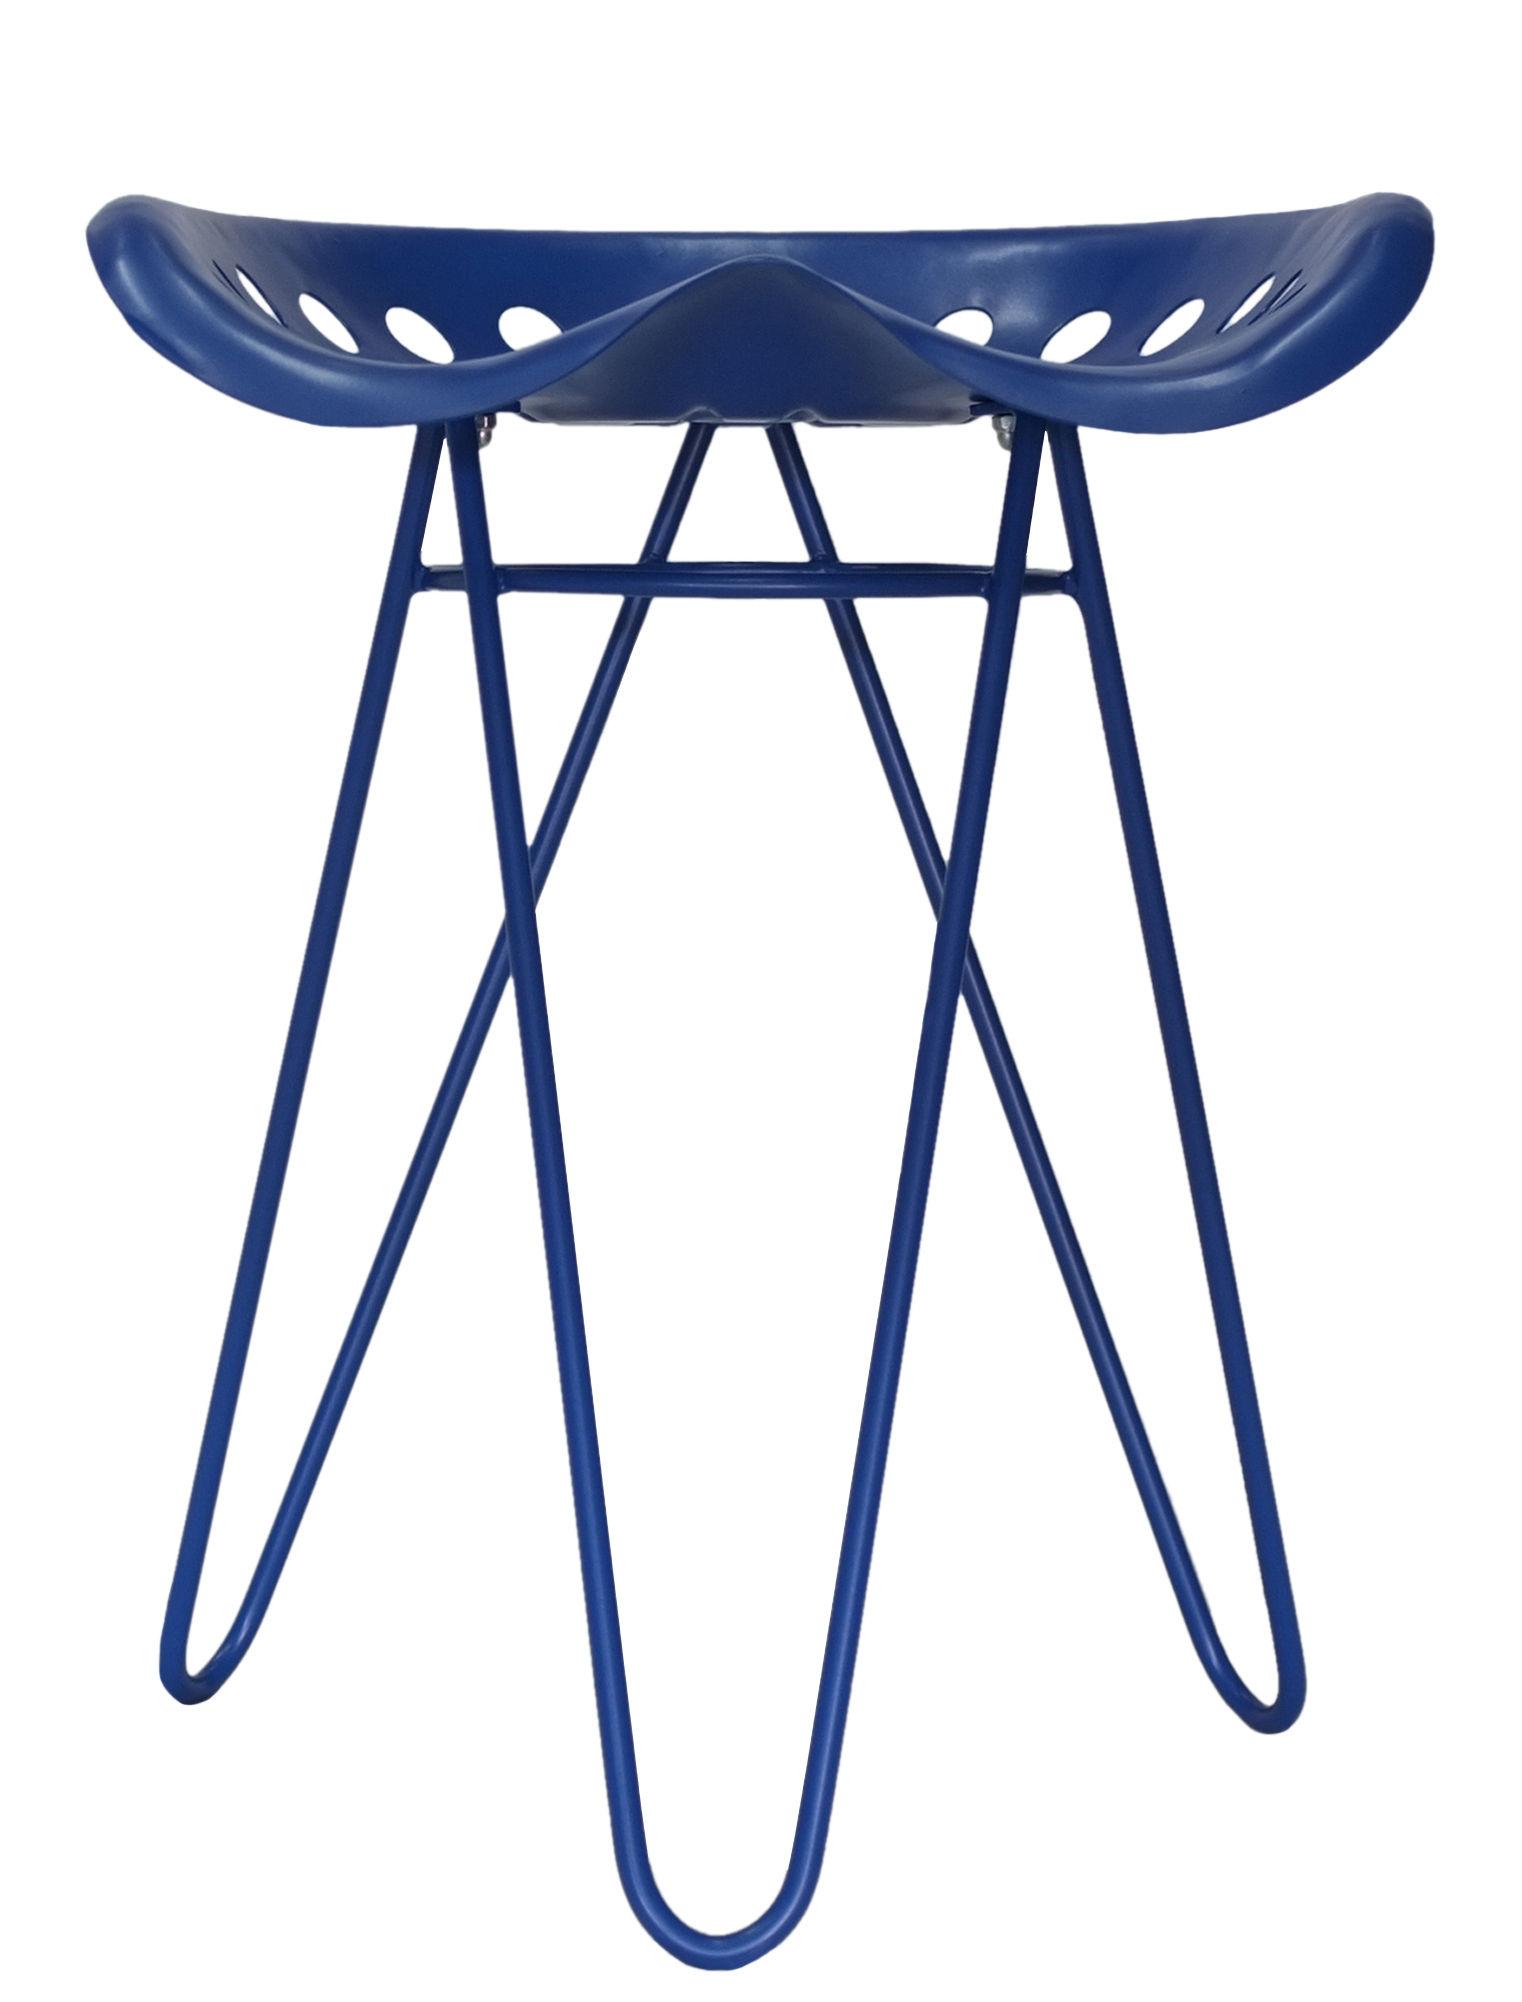 Mobilier - Tabourets bas - Tabouret Gouvy / H 49 cm - Métal - Nantavia - Bleu klein - Acier